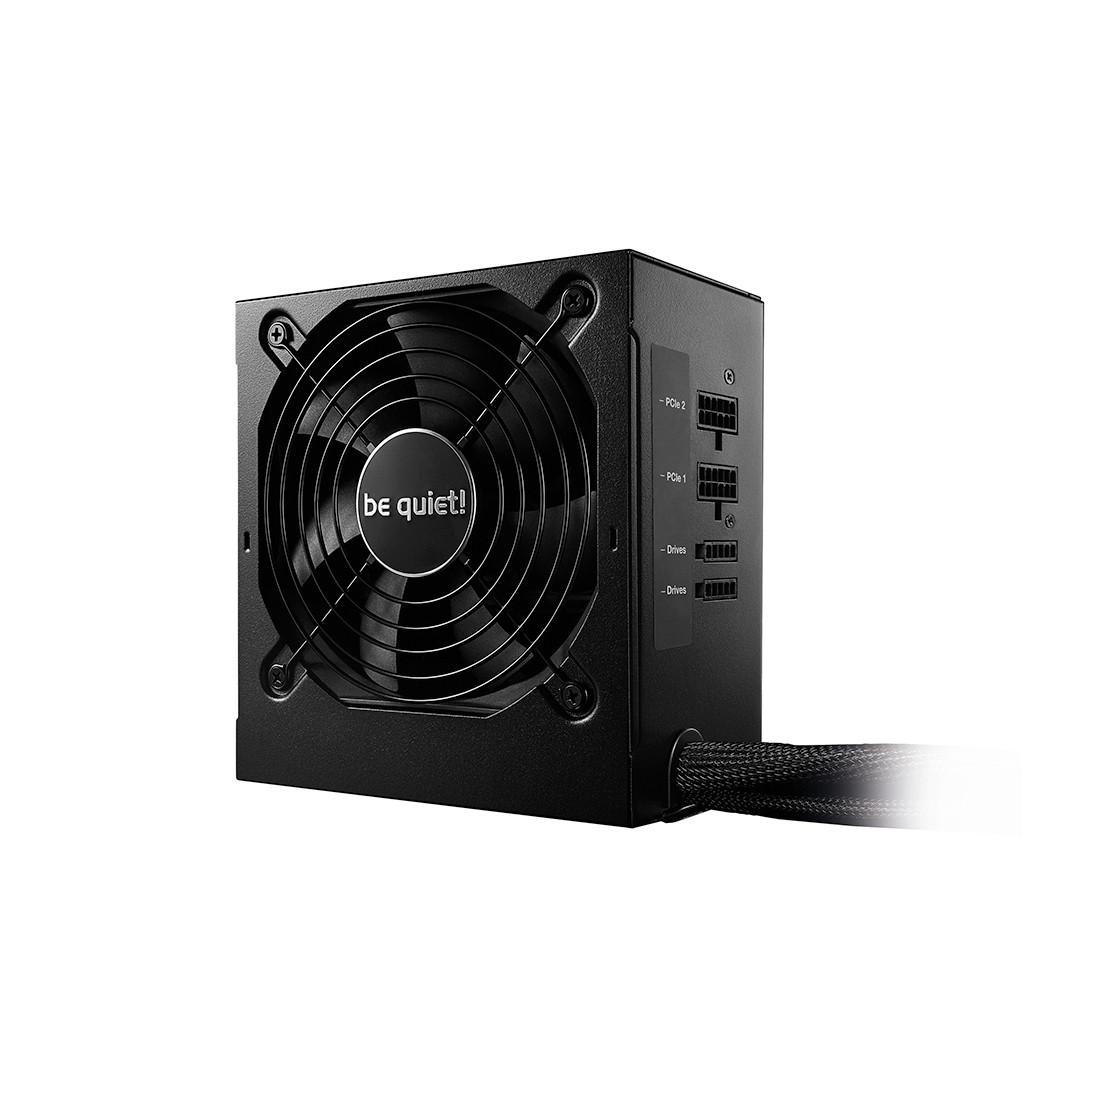 Блок питания, Bequiet!, System Power 9 500W CM, BN301, 500W, 80 PLUS Bronze